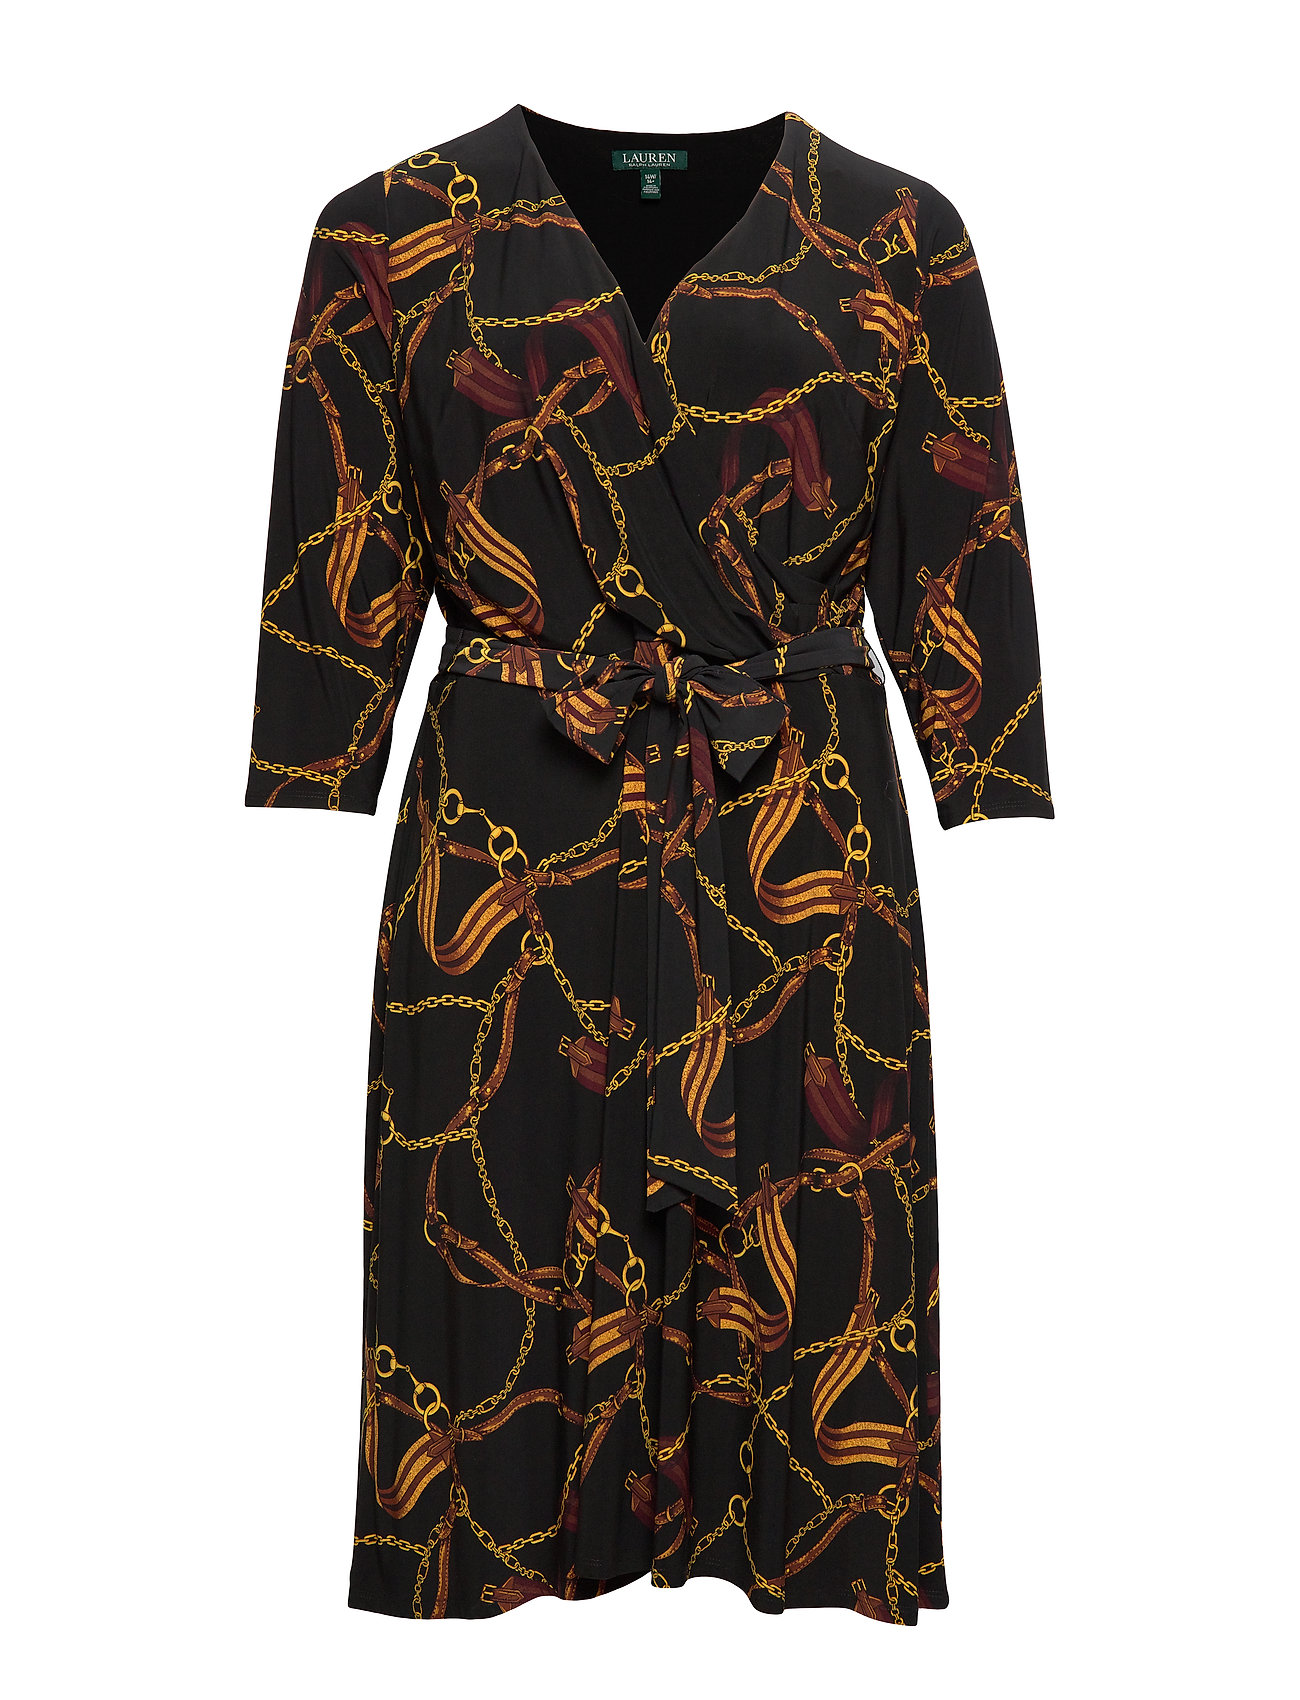 Lauren Women PRINTED MATTE JRSY-DRESS - BLACK/GOLD/MULTI